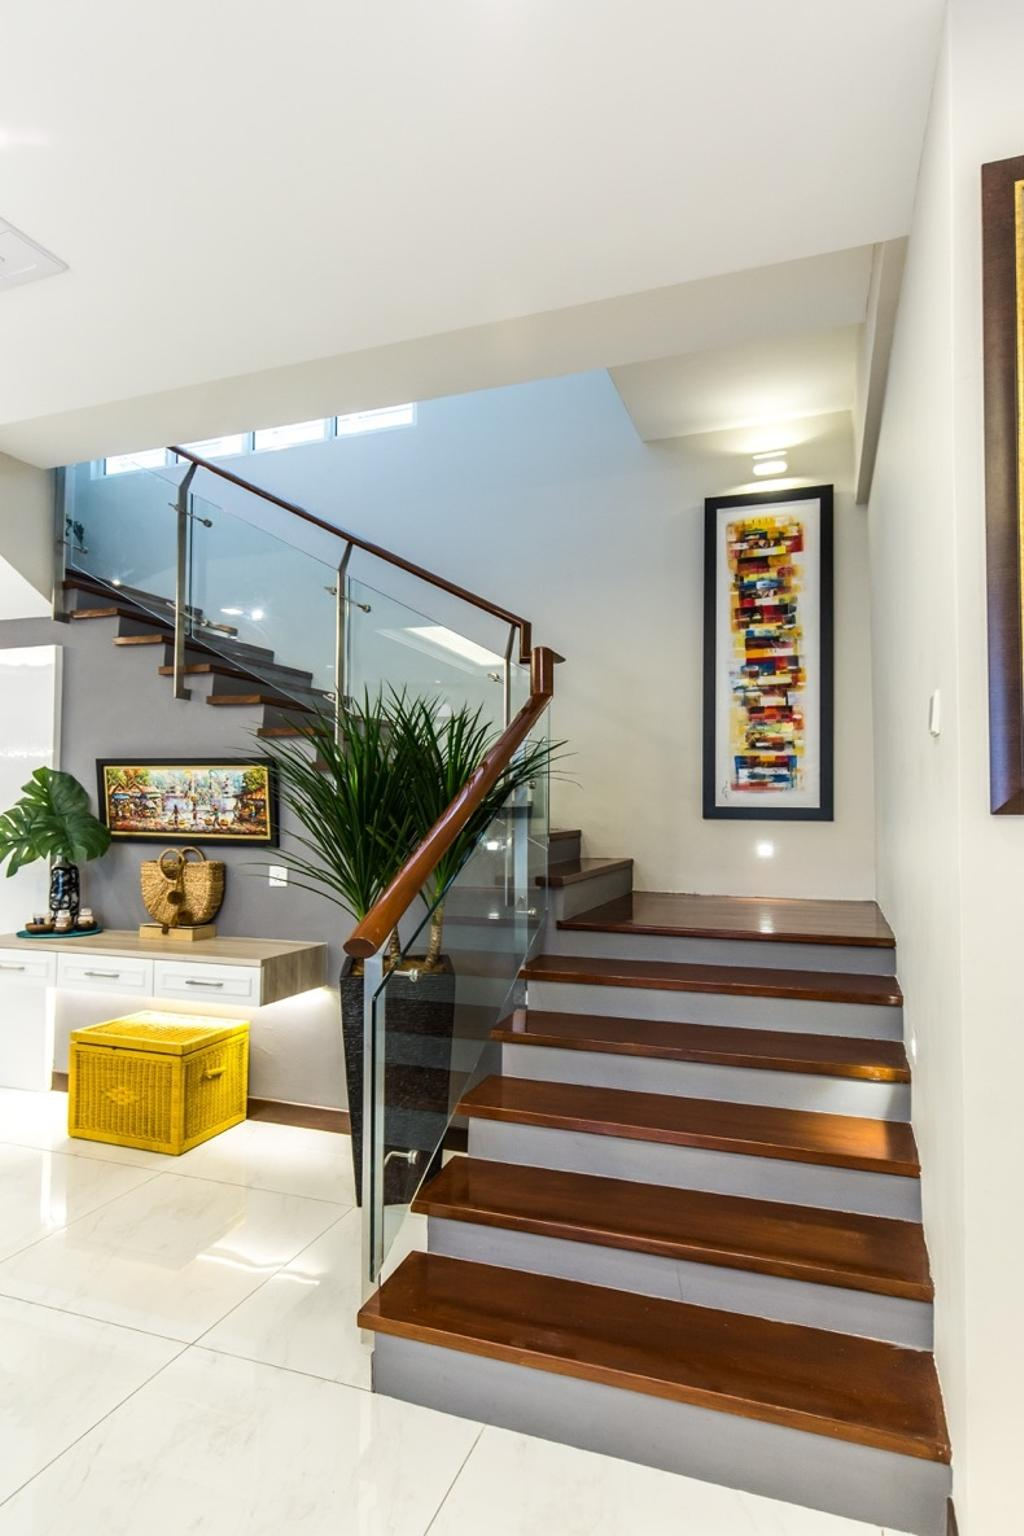 Modern, Landed, Bungalow, Setia Alam, Interior Designer, Klaasmen Sdn. Bhd., Flora, Jar, Plant, Potted Plant, Pottery, Vase, Banister, Handrail, Staircase